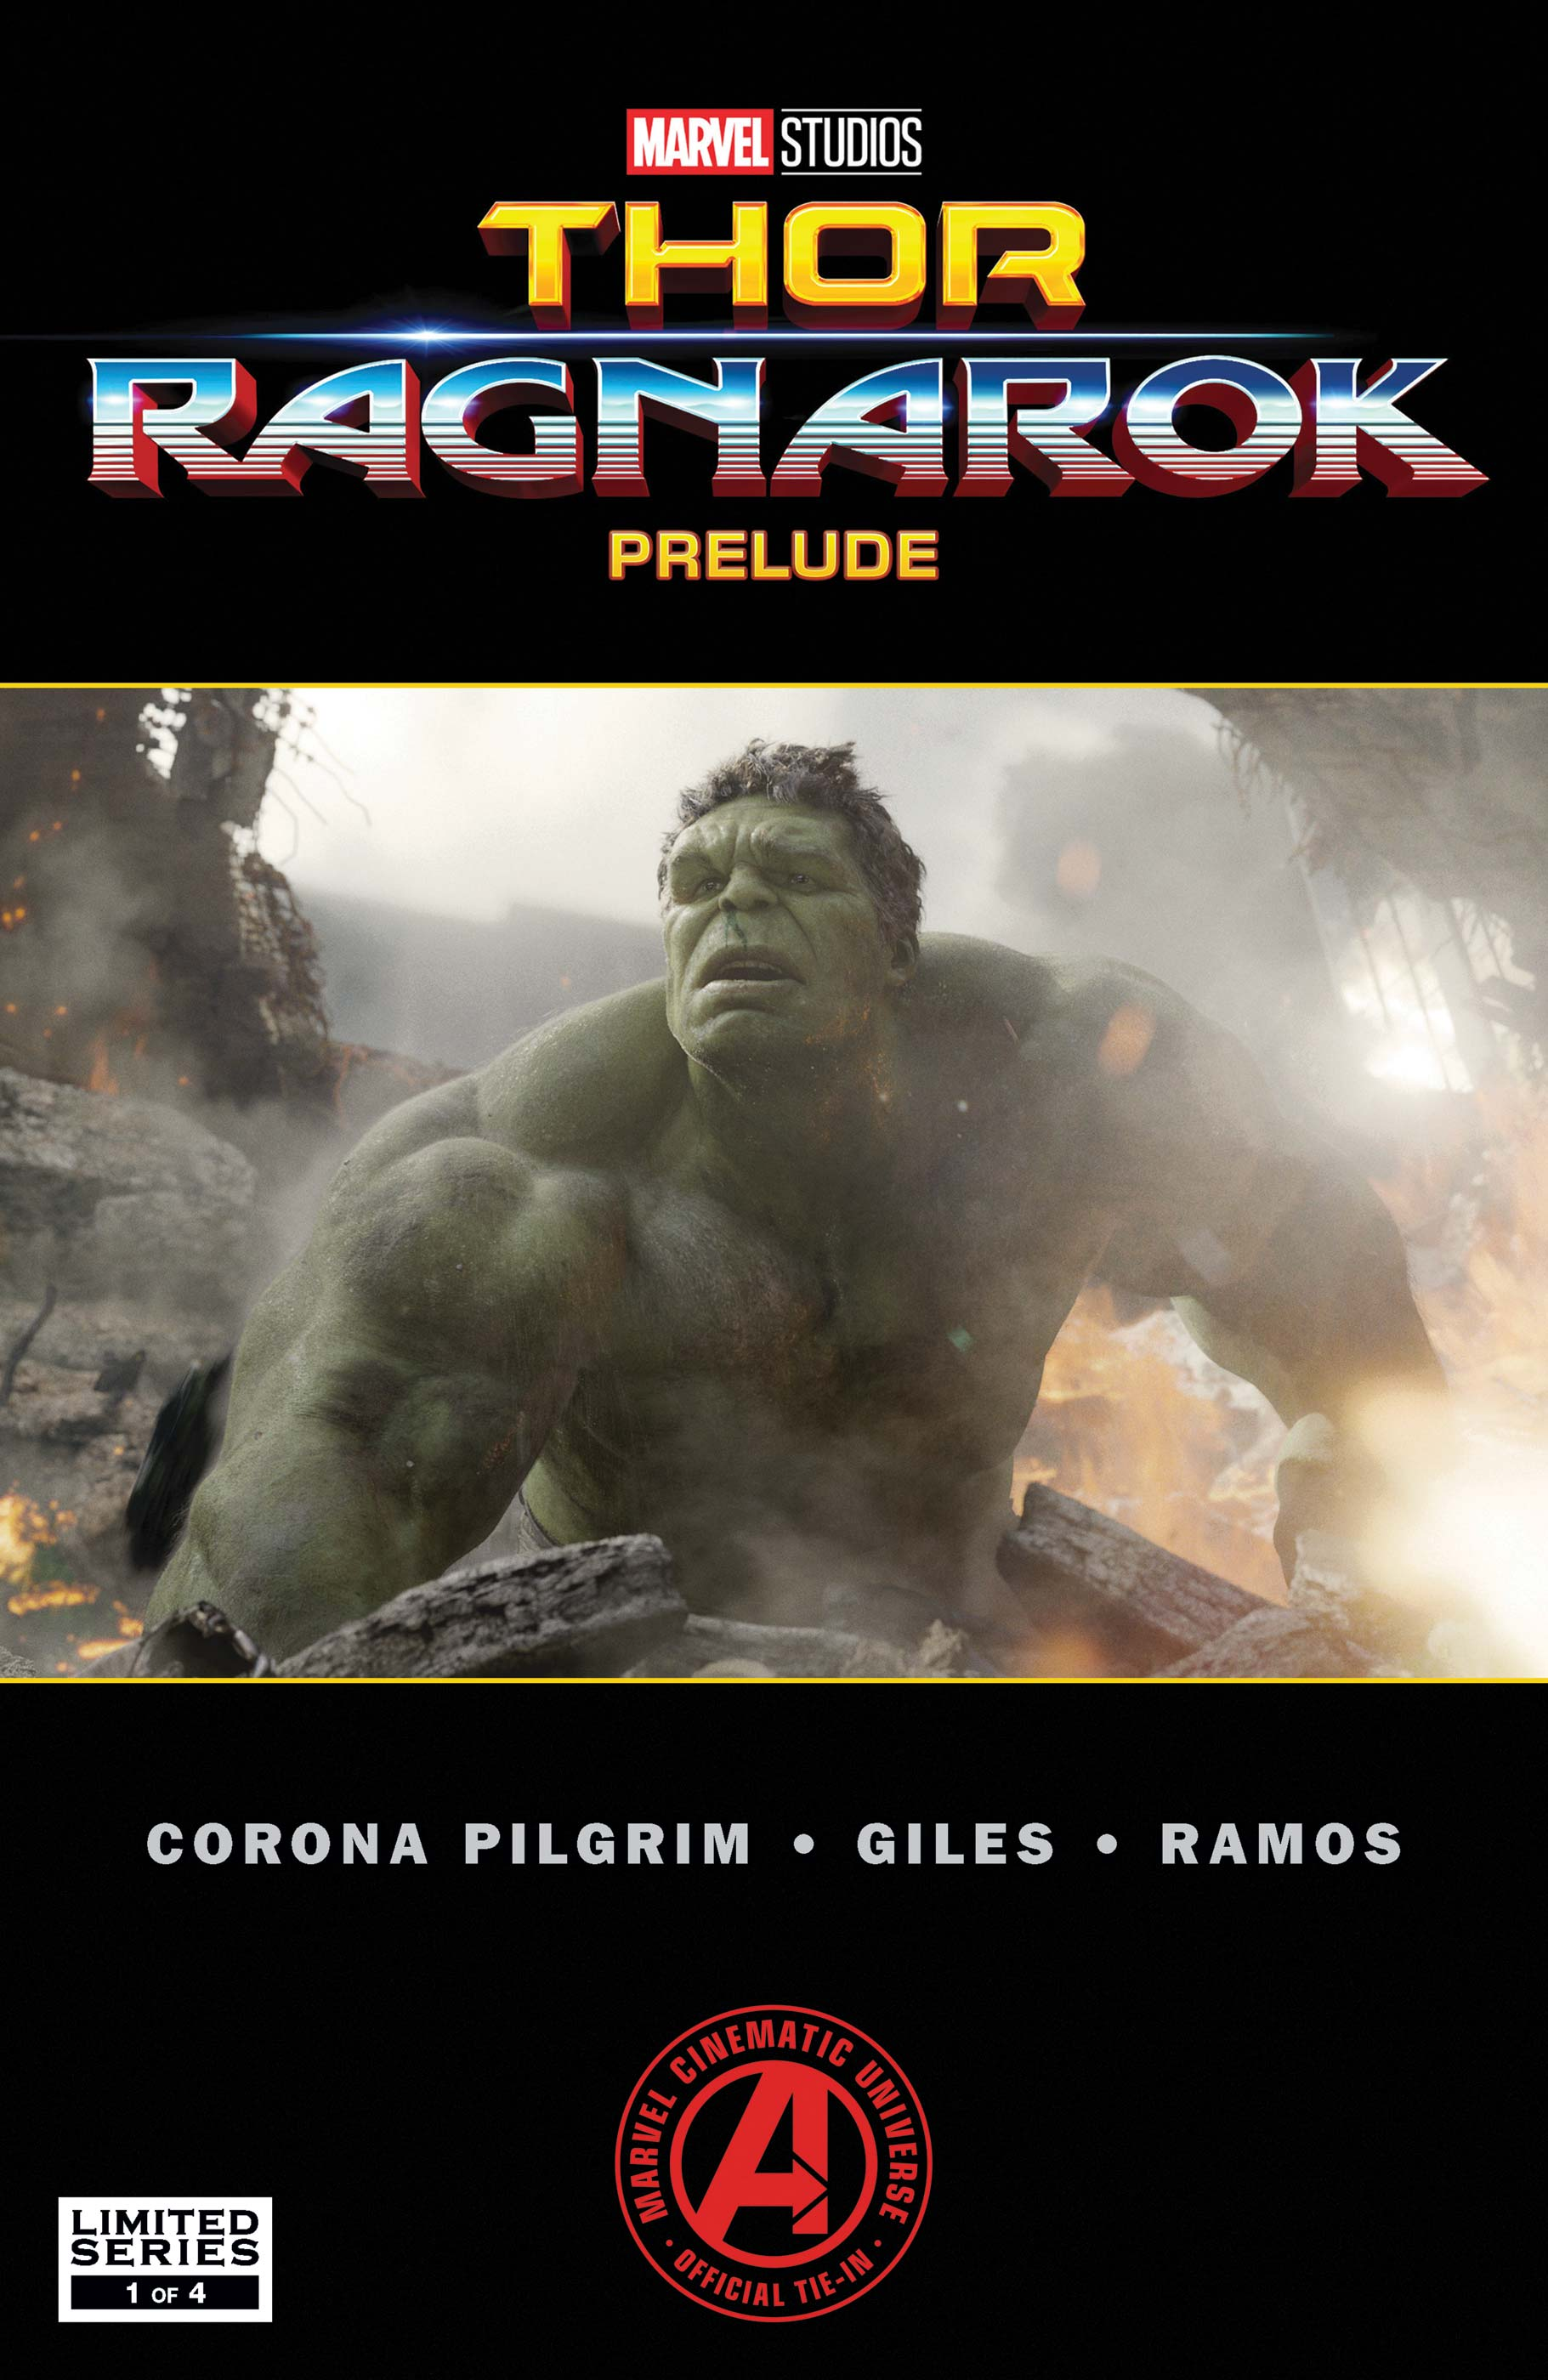 Marvel's Thor: Ragnarok Prelude (2017) #1